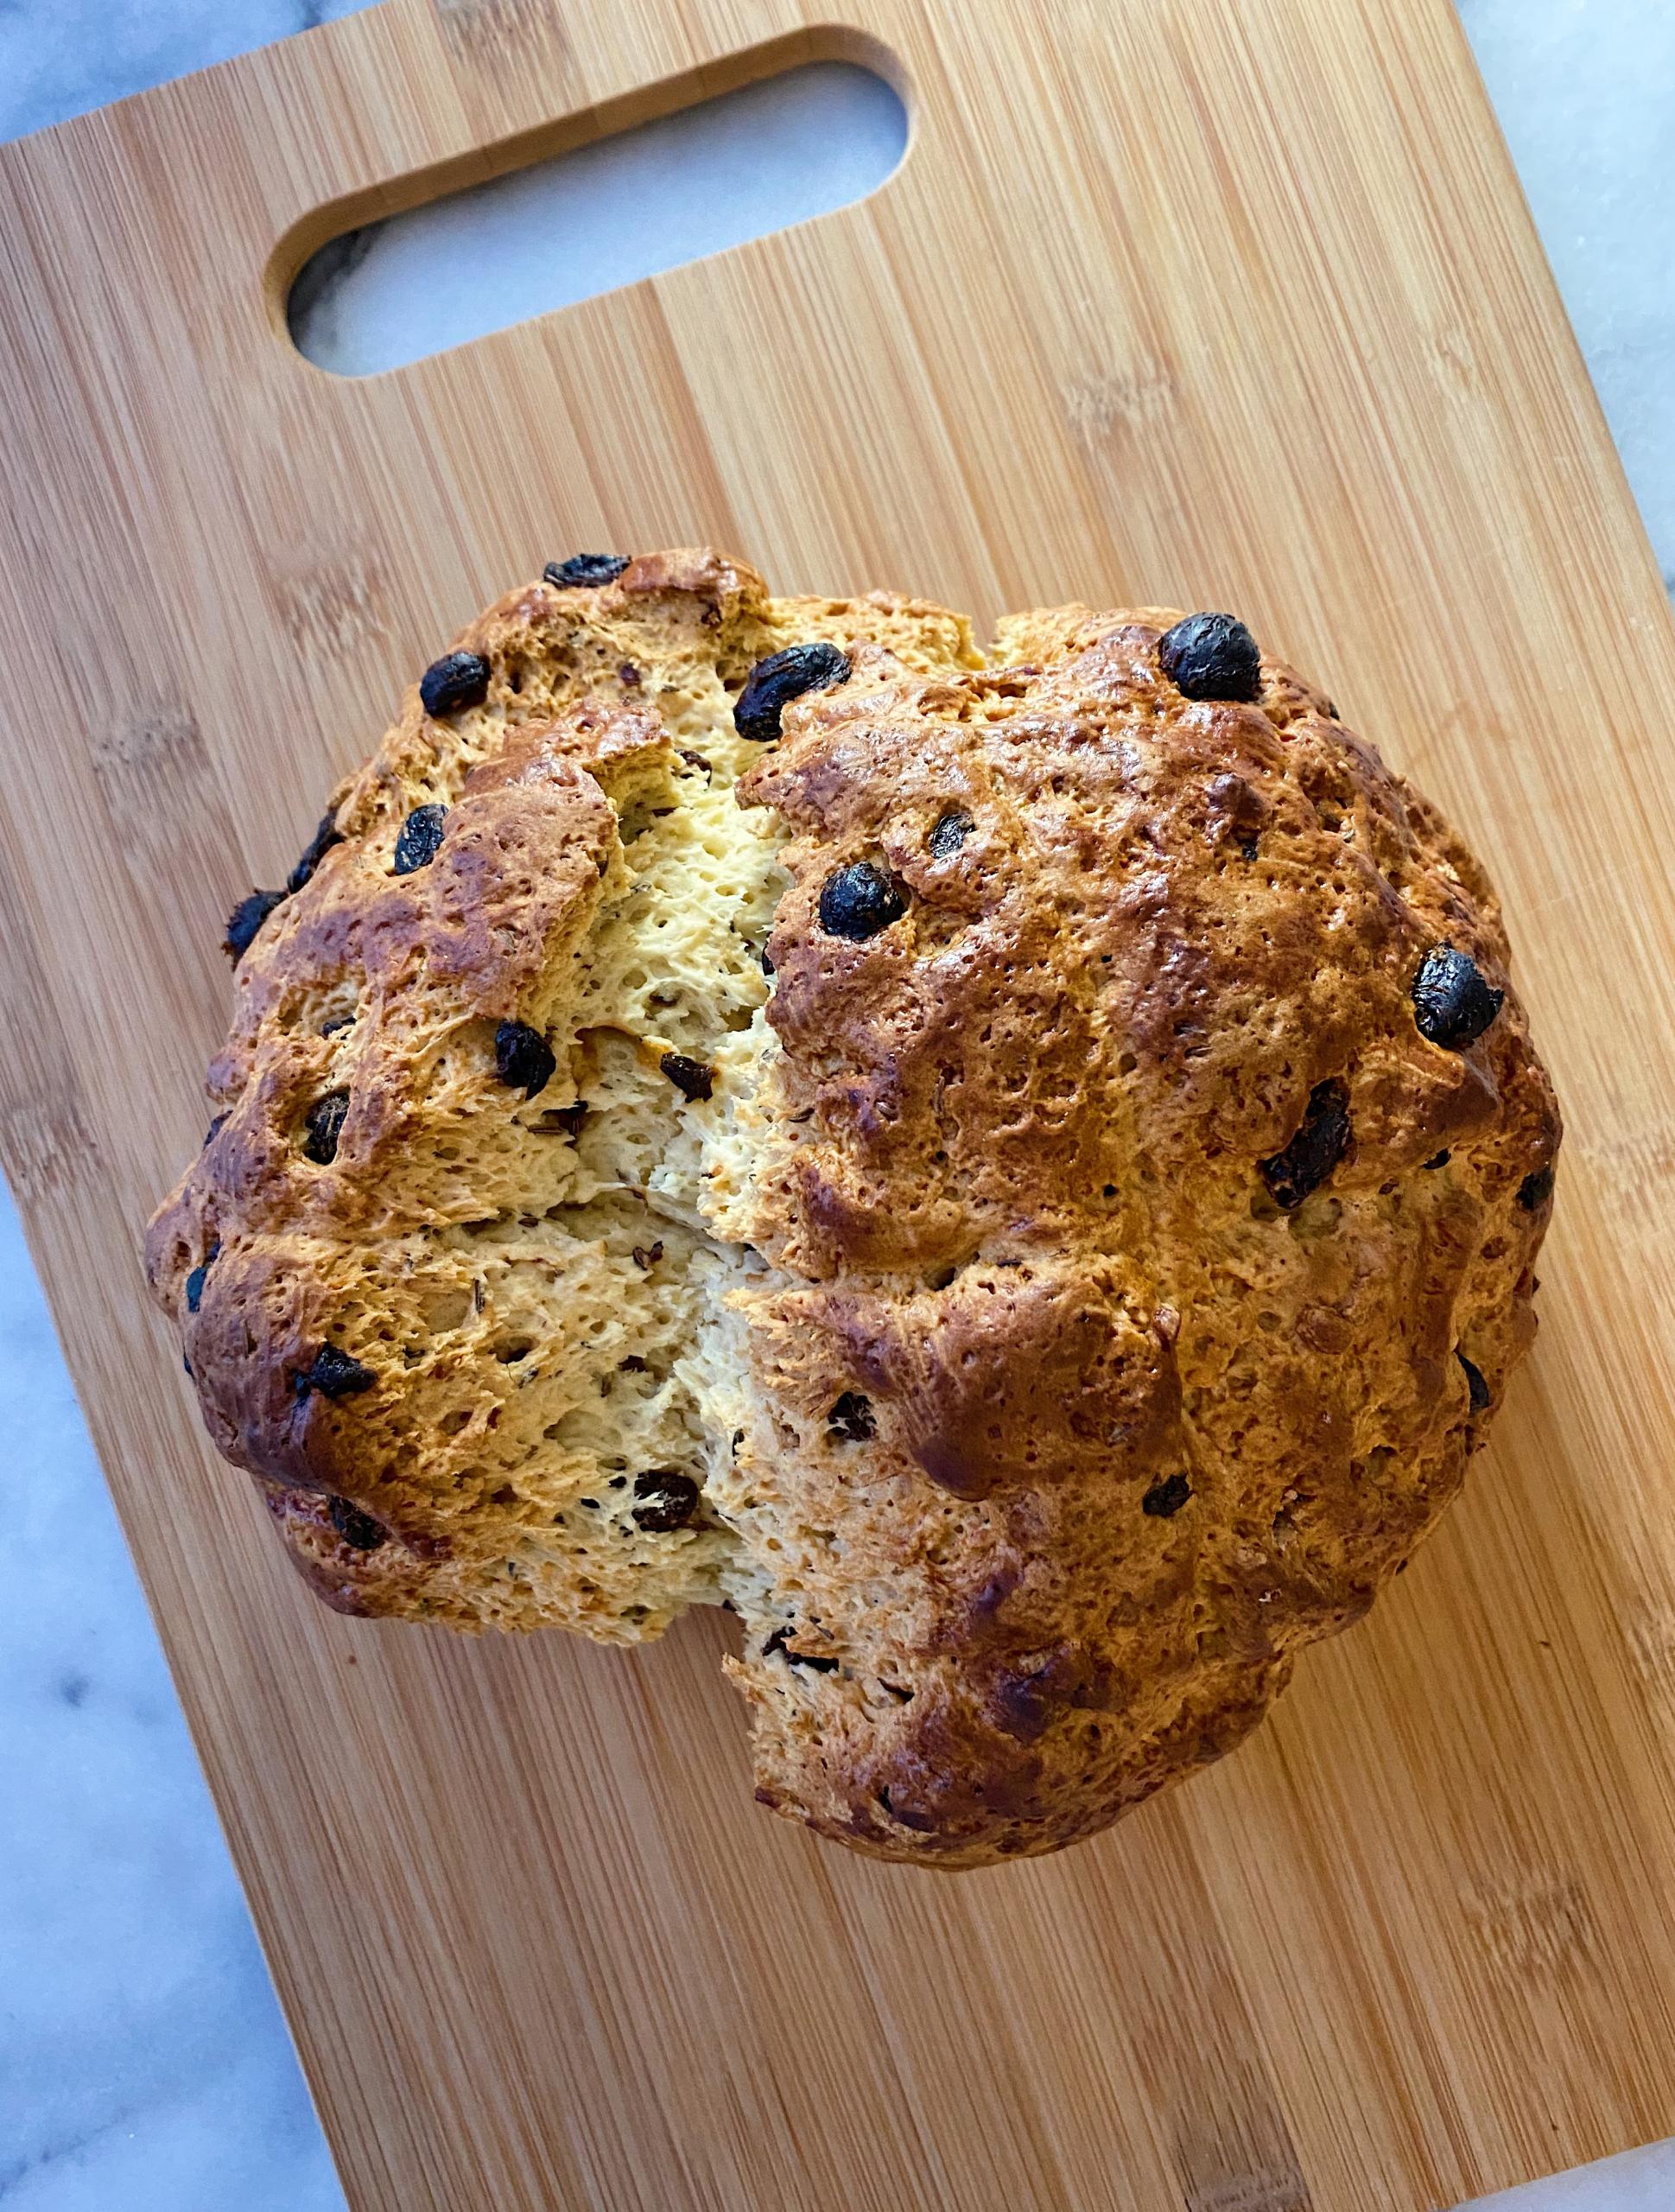 best gluten free irish soda bread easy recipe www.healthygffamily.com